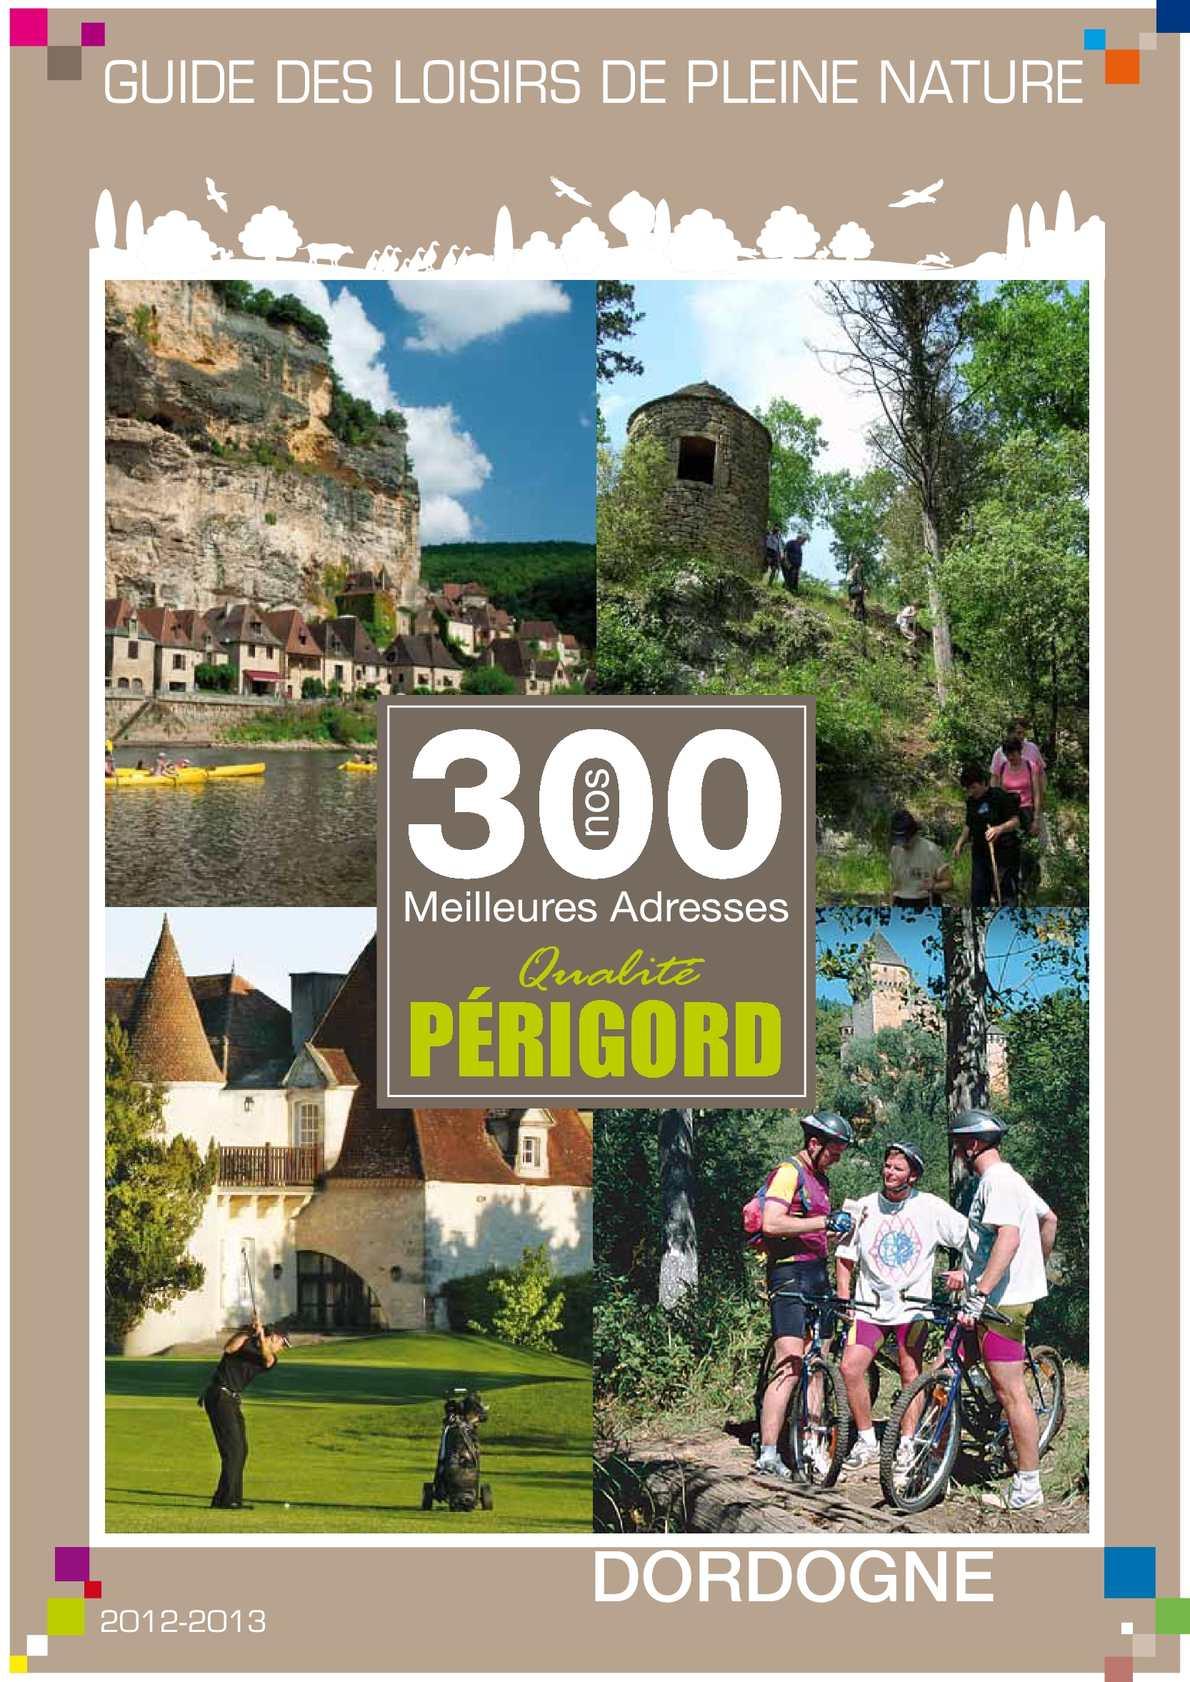 Guide des Loisirs Nature Dordogne Périgord 2012